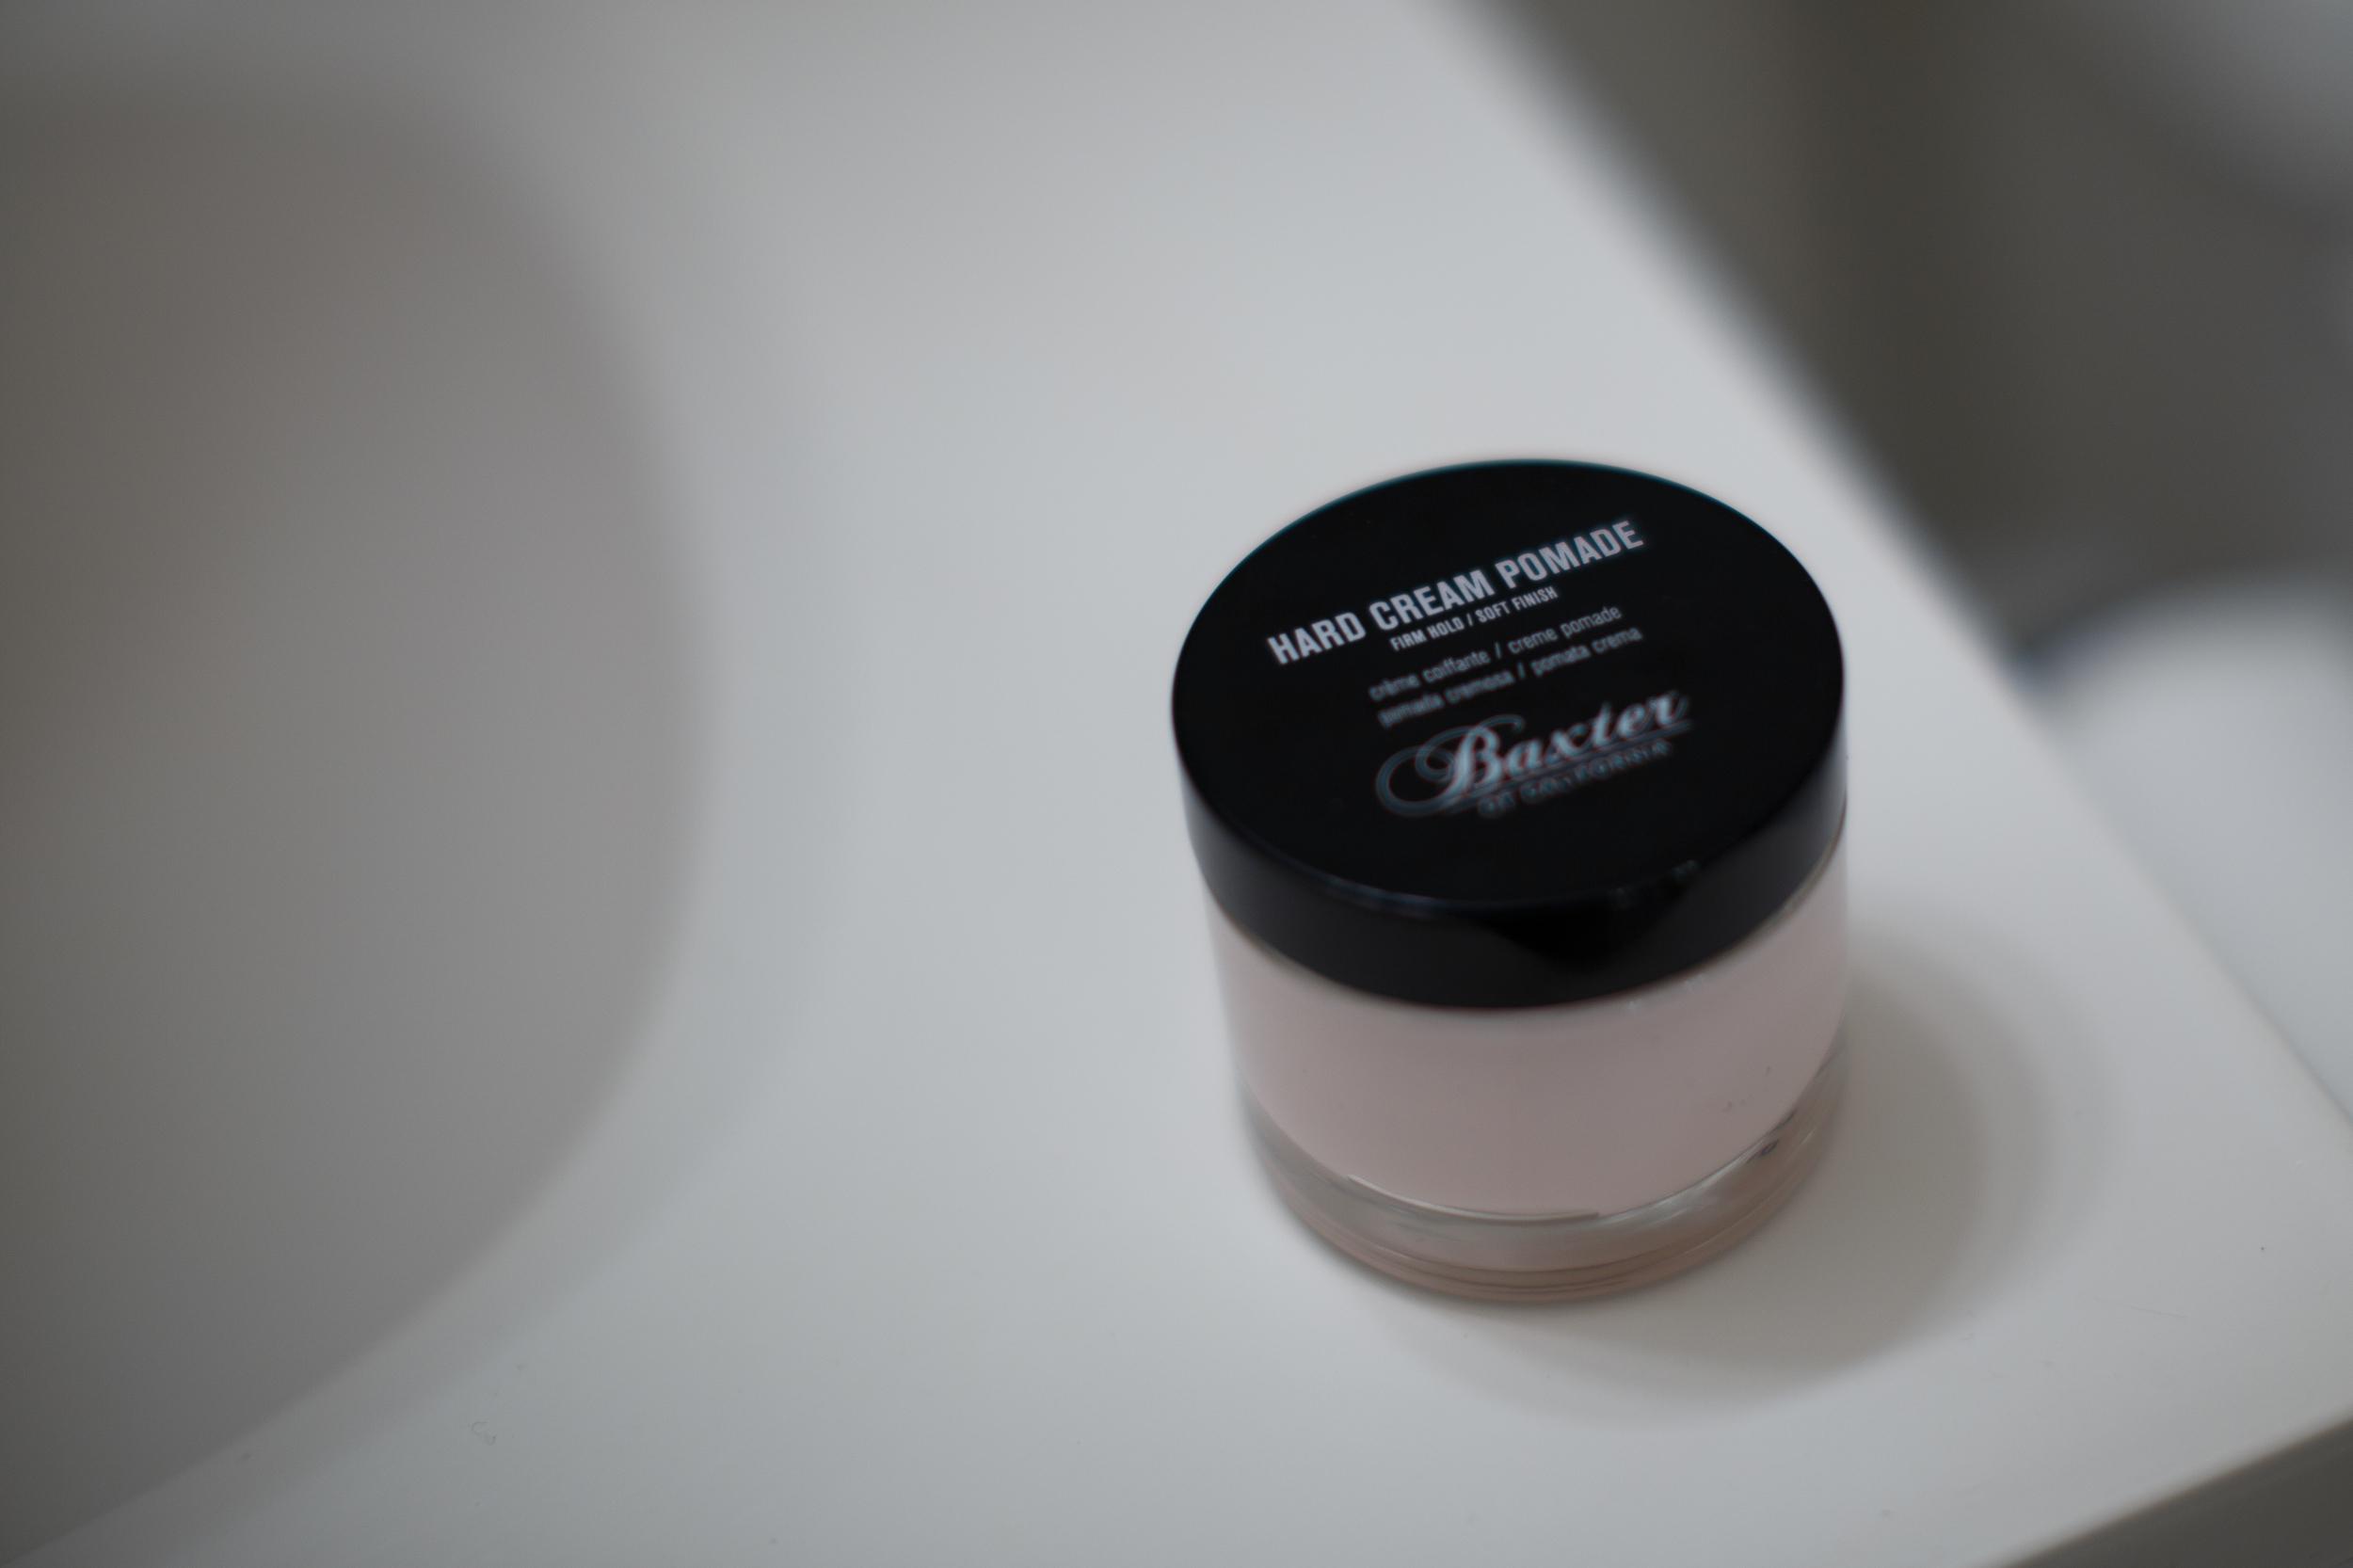 Baxter of California Hard Cream Pomade jar